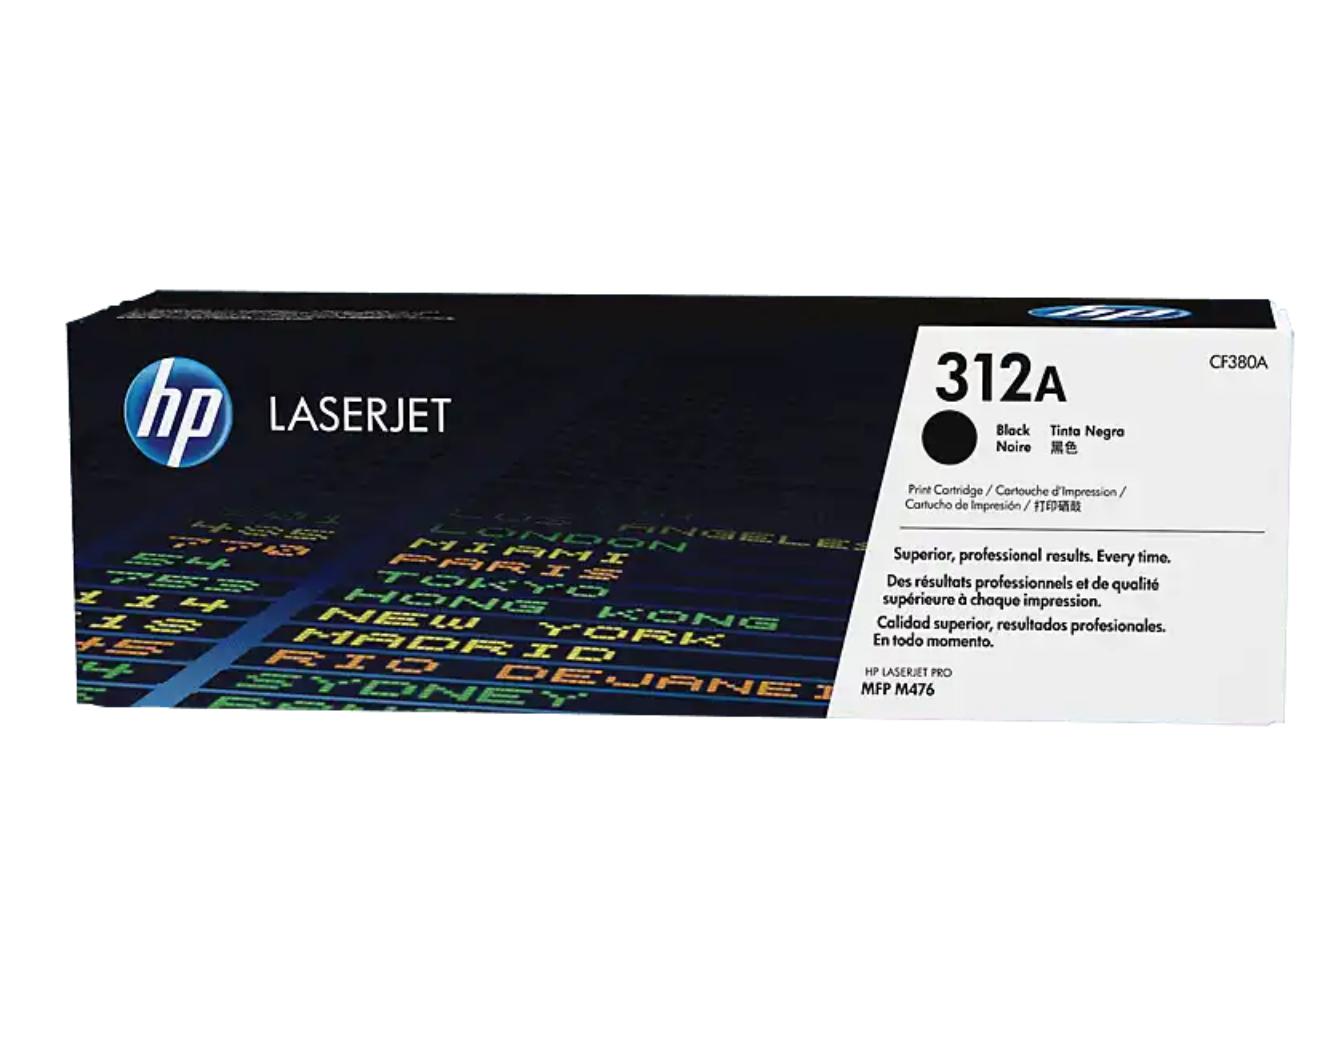 HP 312A 黑色原廠 LaserJet 碳粉 CF380A